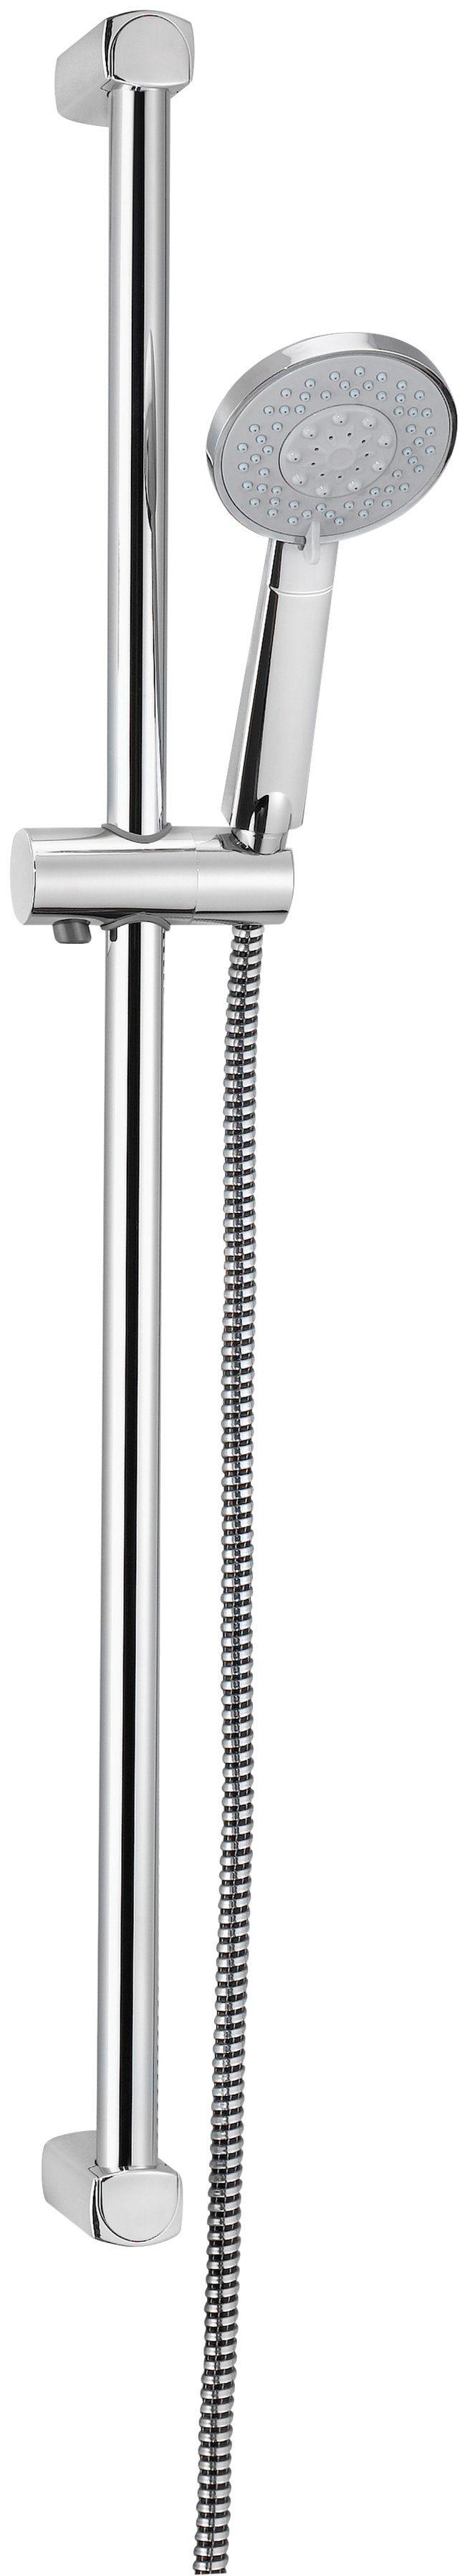 ADOB Brause-Set »Unico V 60 cm«